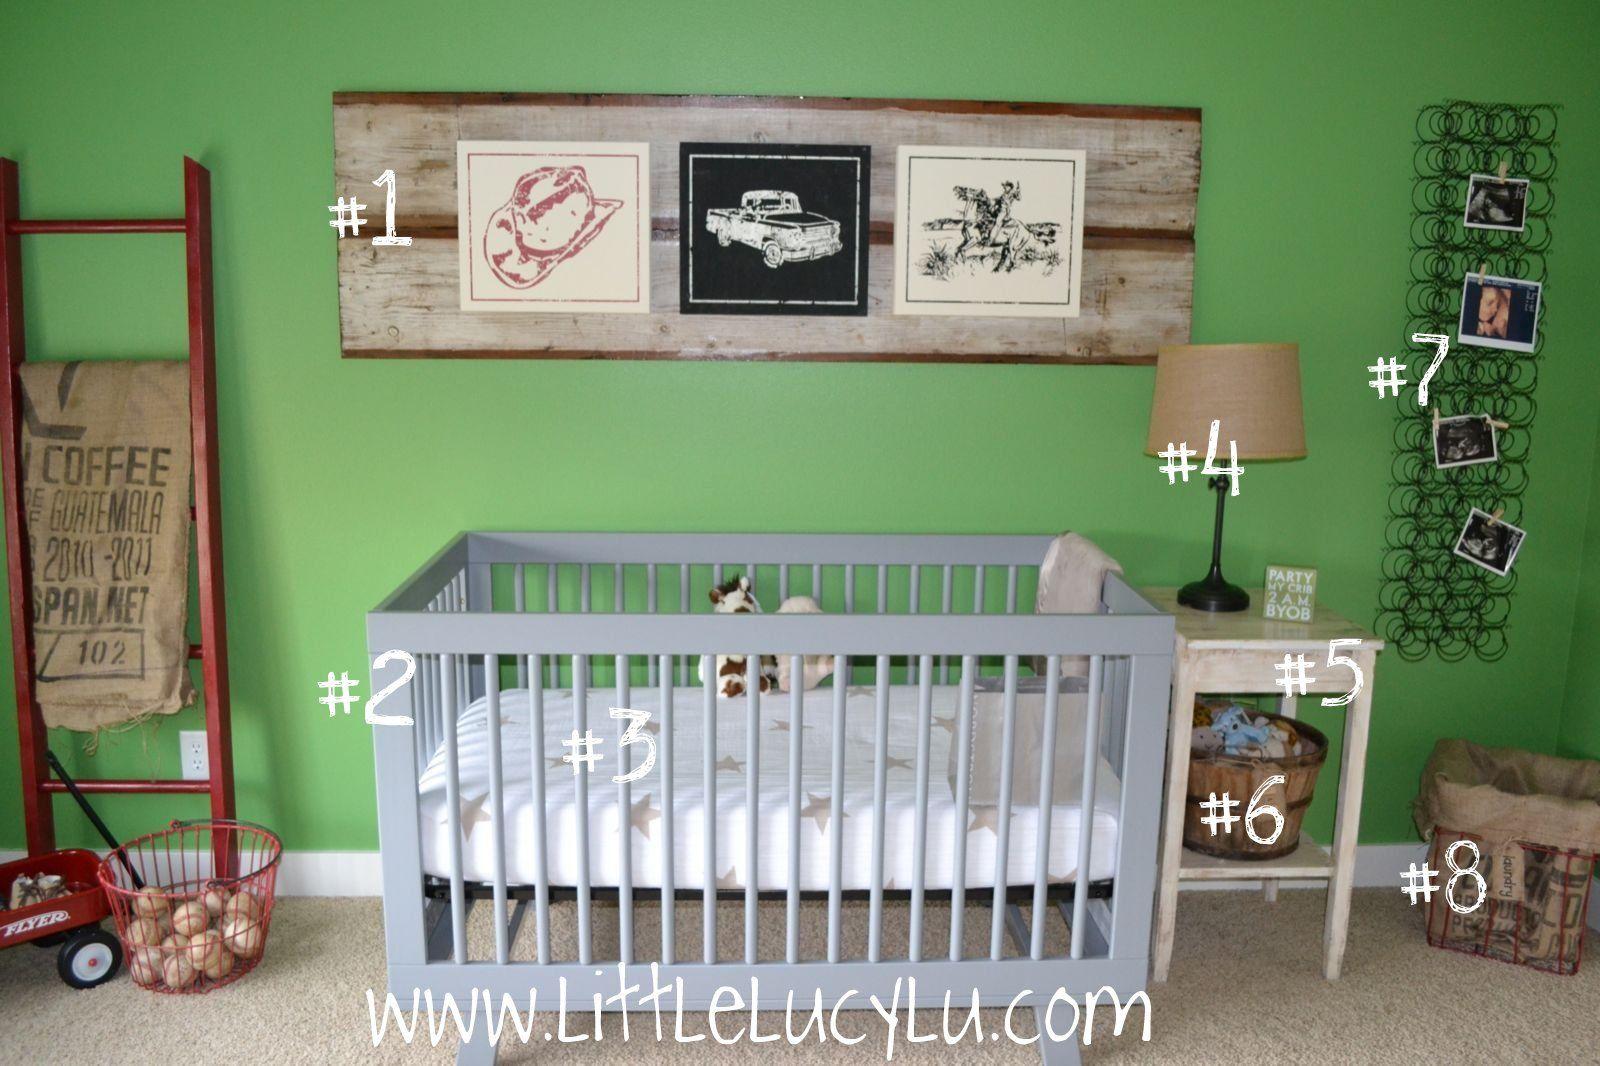 More wall art pallets u old barn wood pinterest barn wood